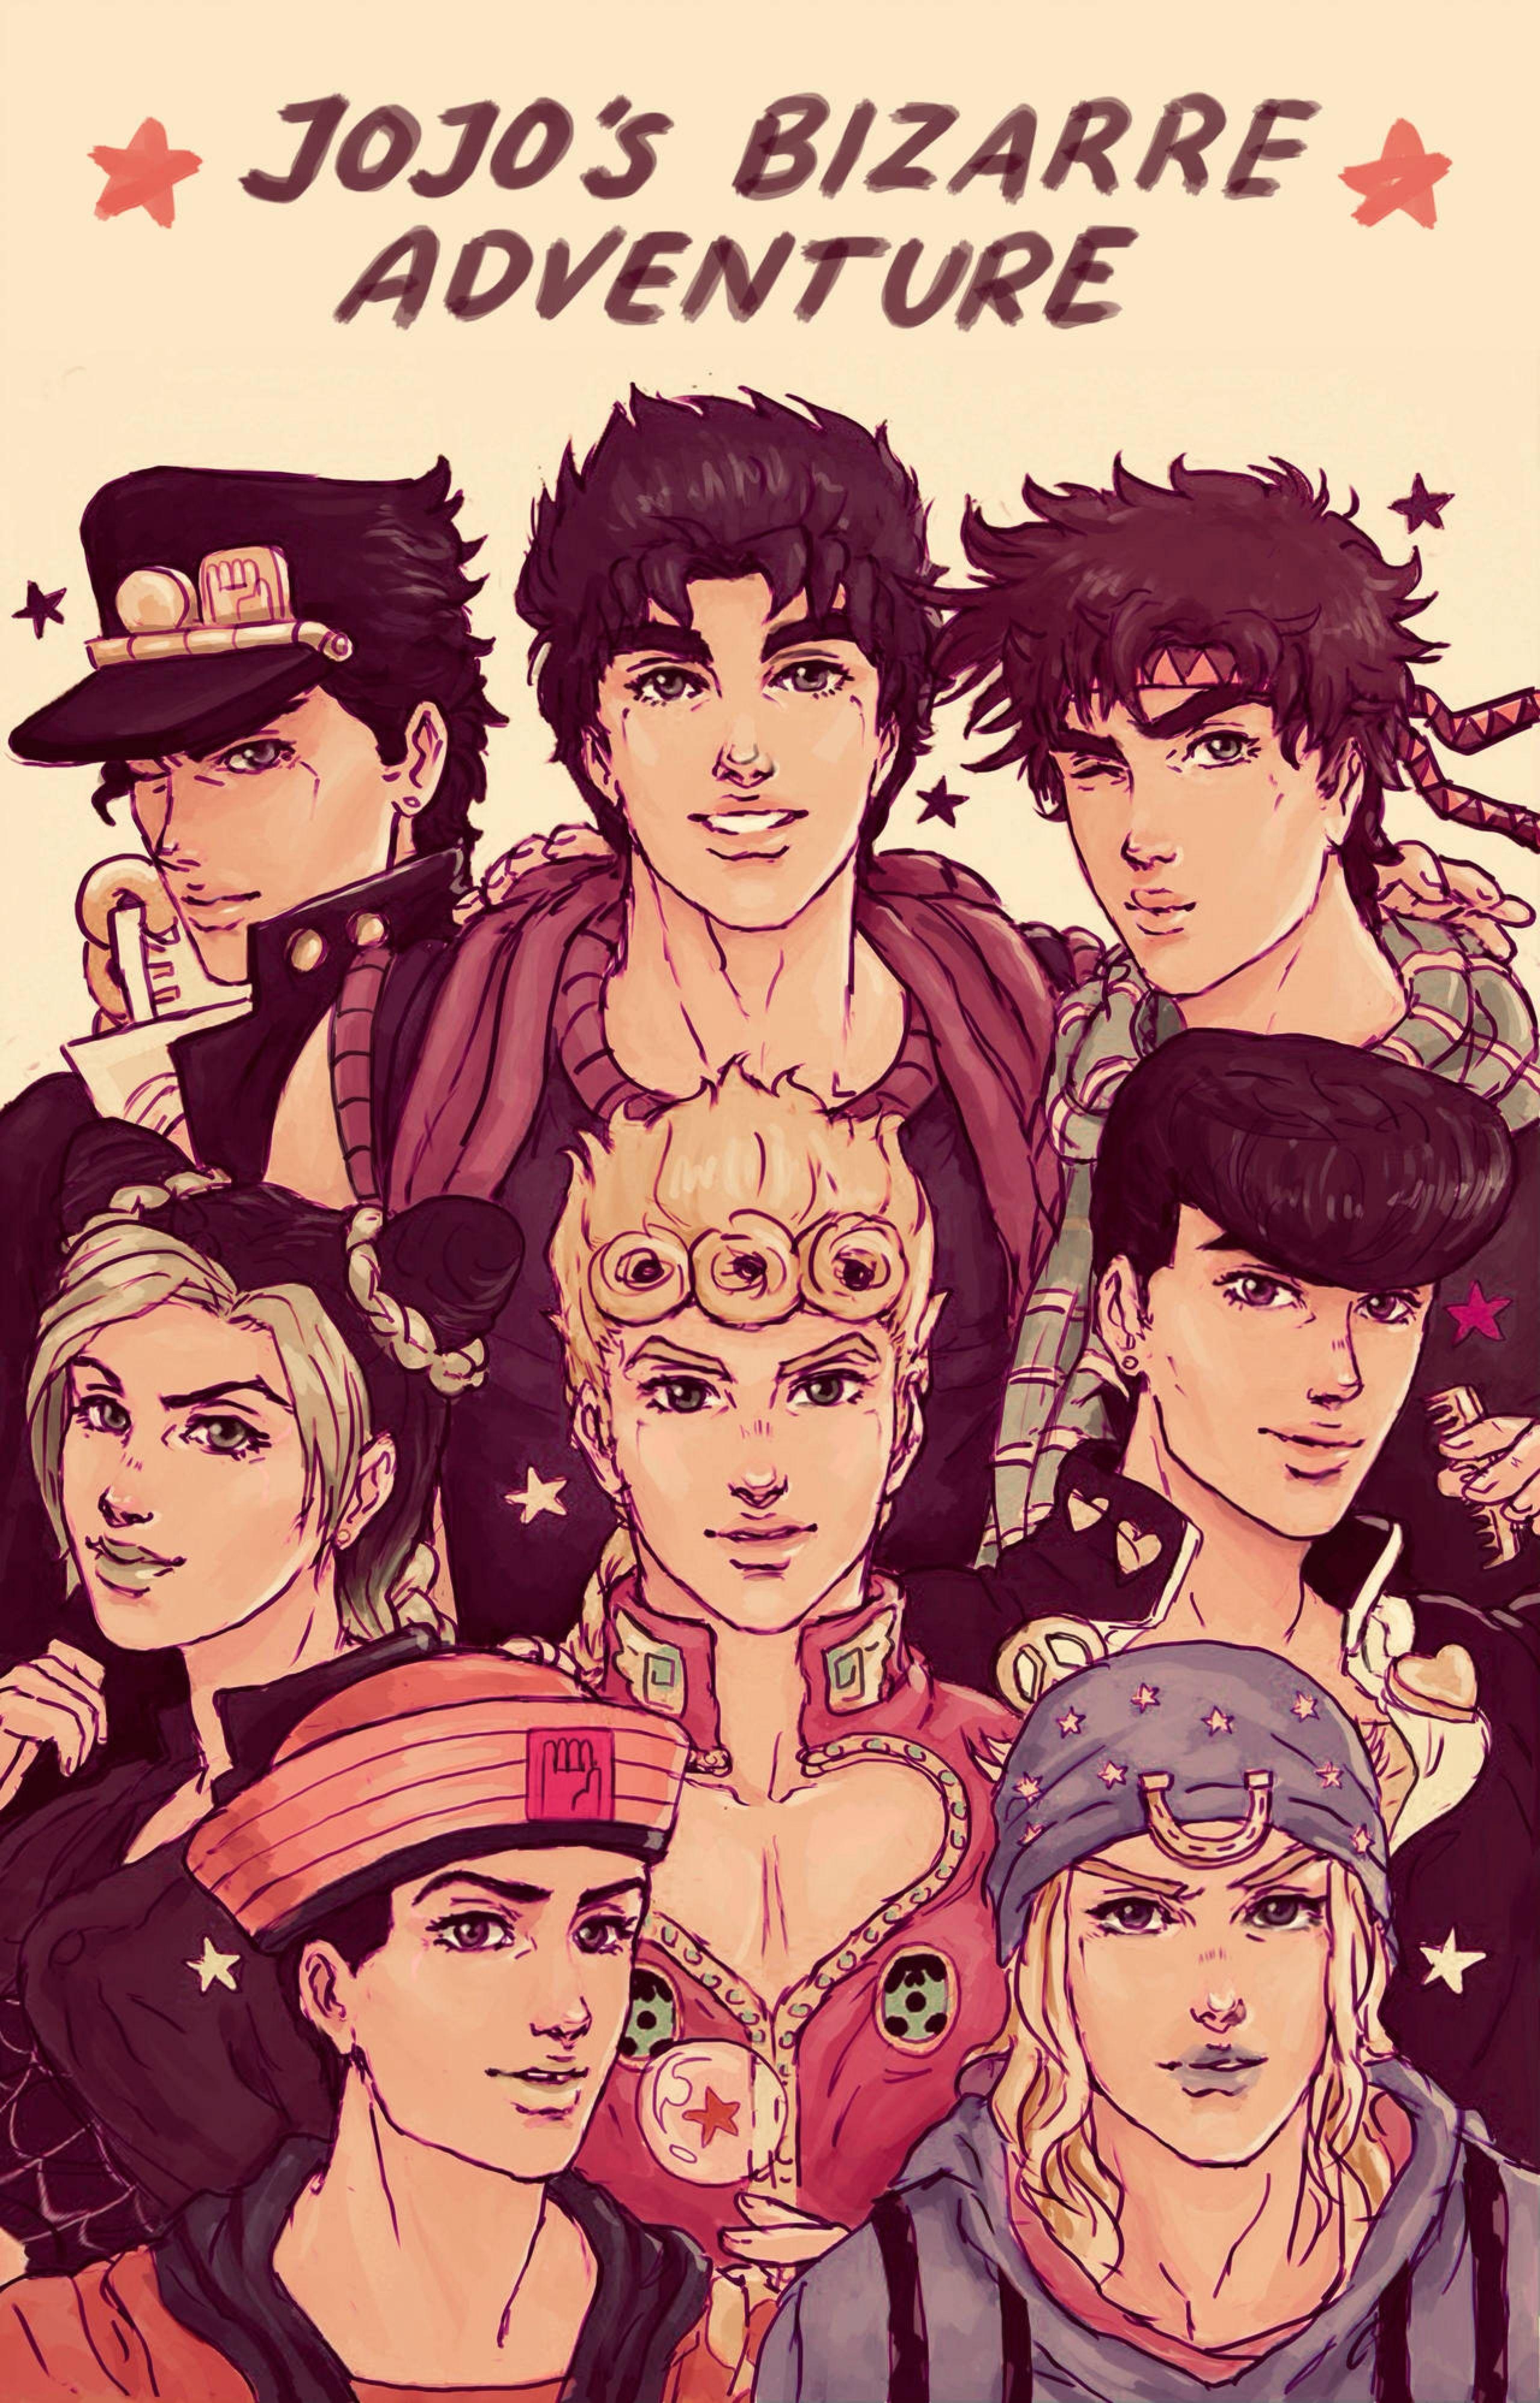 Joestar Day By Iahme2 On Deviantart Jojo Anime Jojo Bizzare